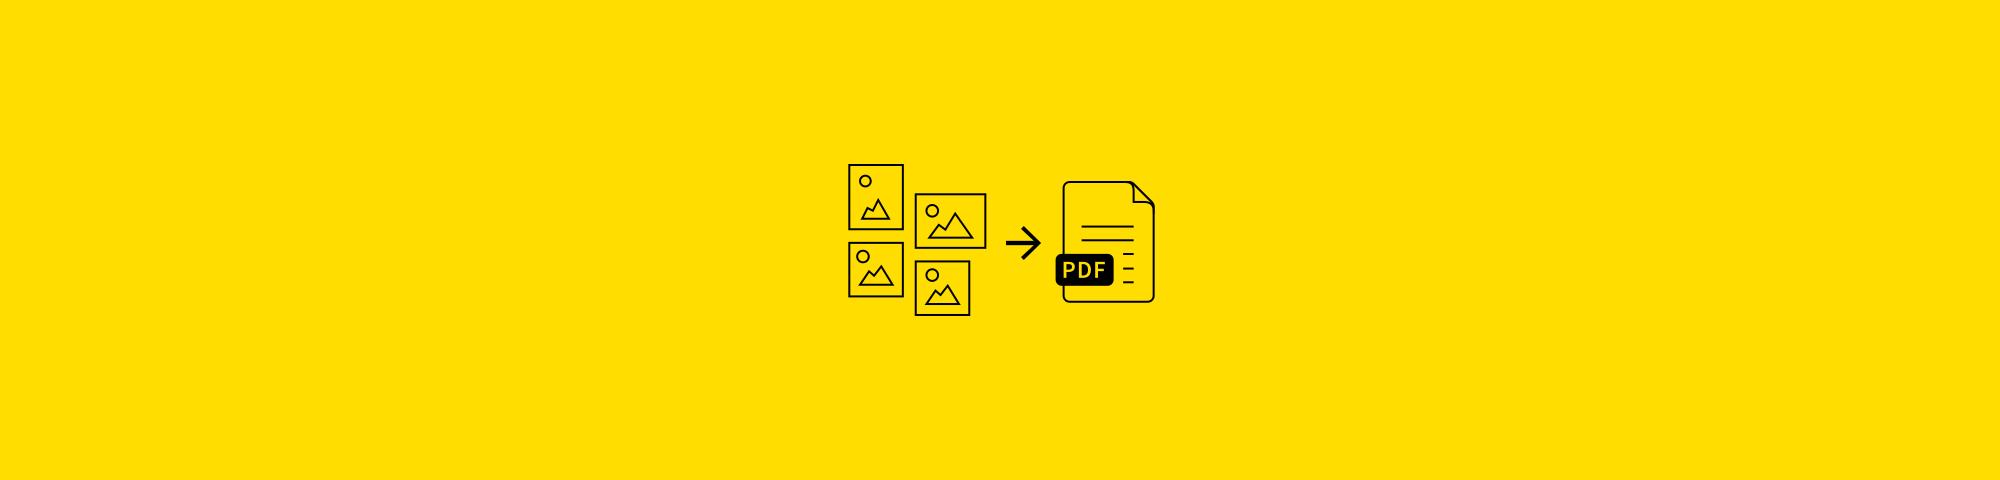 Convertir png a pdf